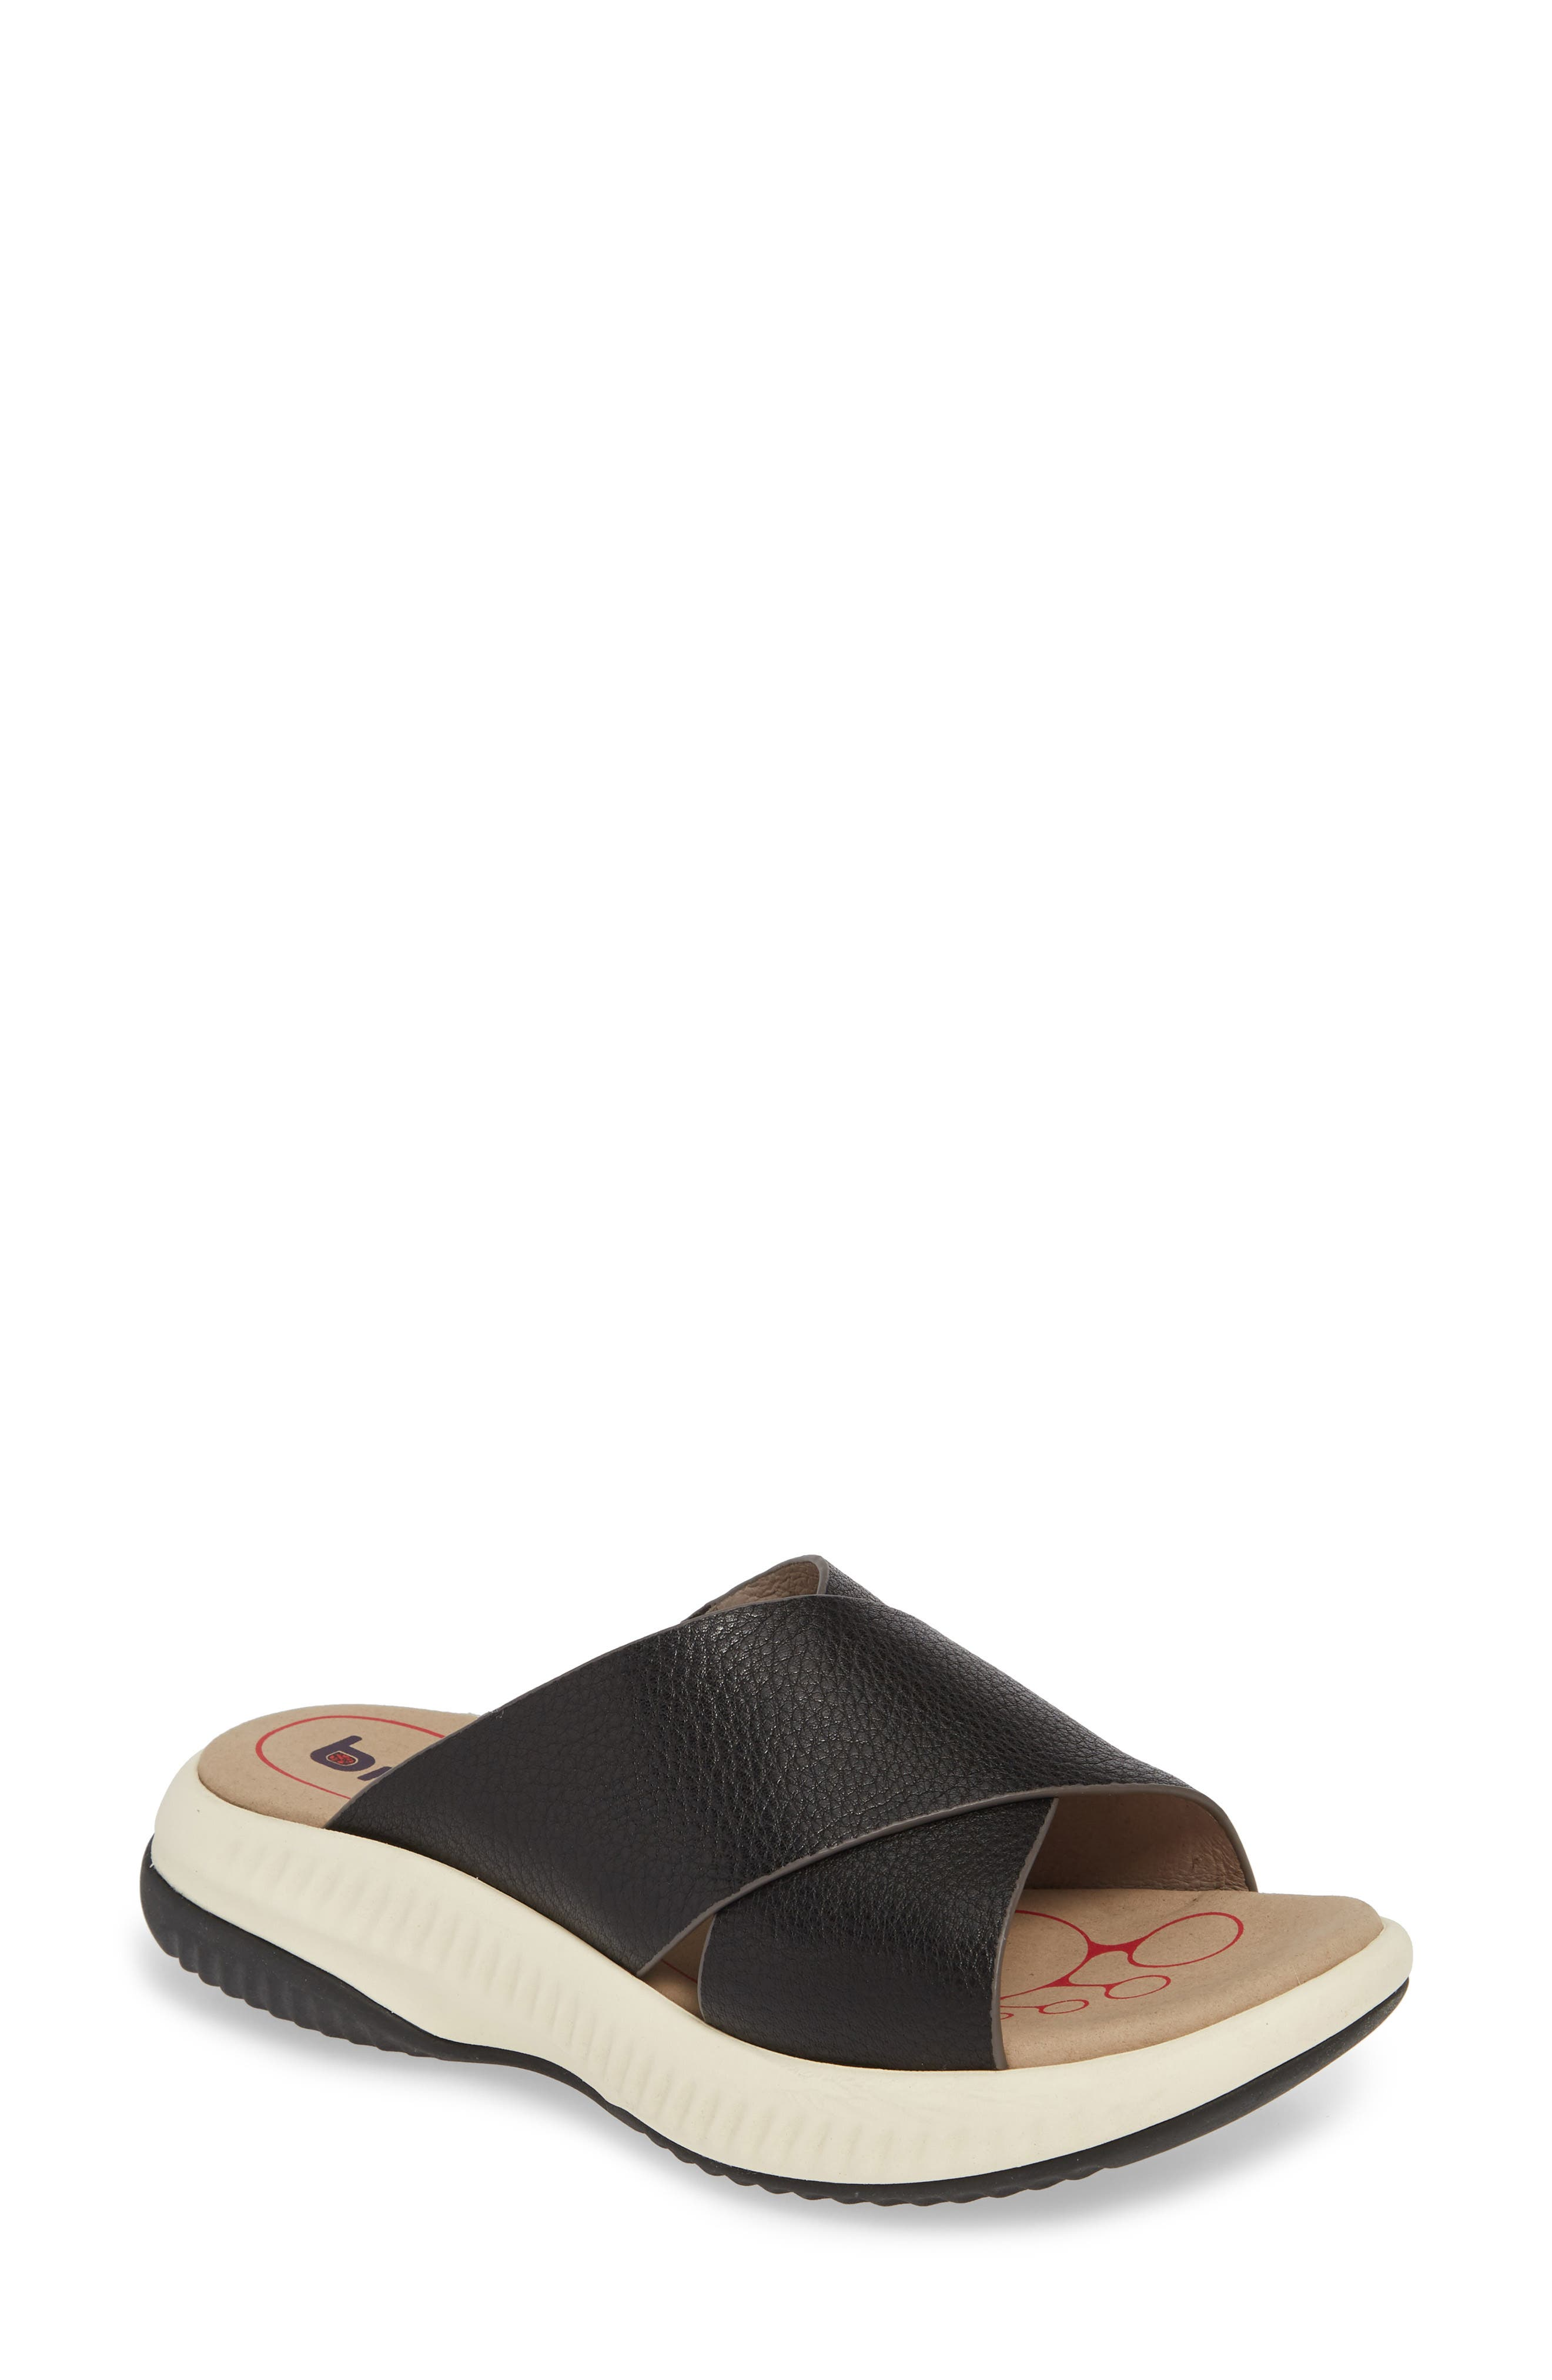 Bionica Ambridge Slide Sandal, Black